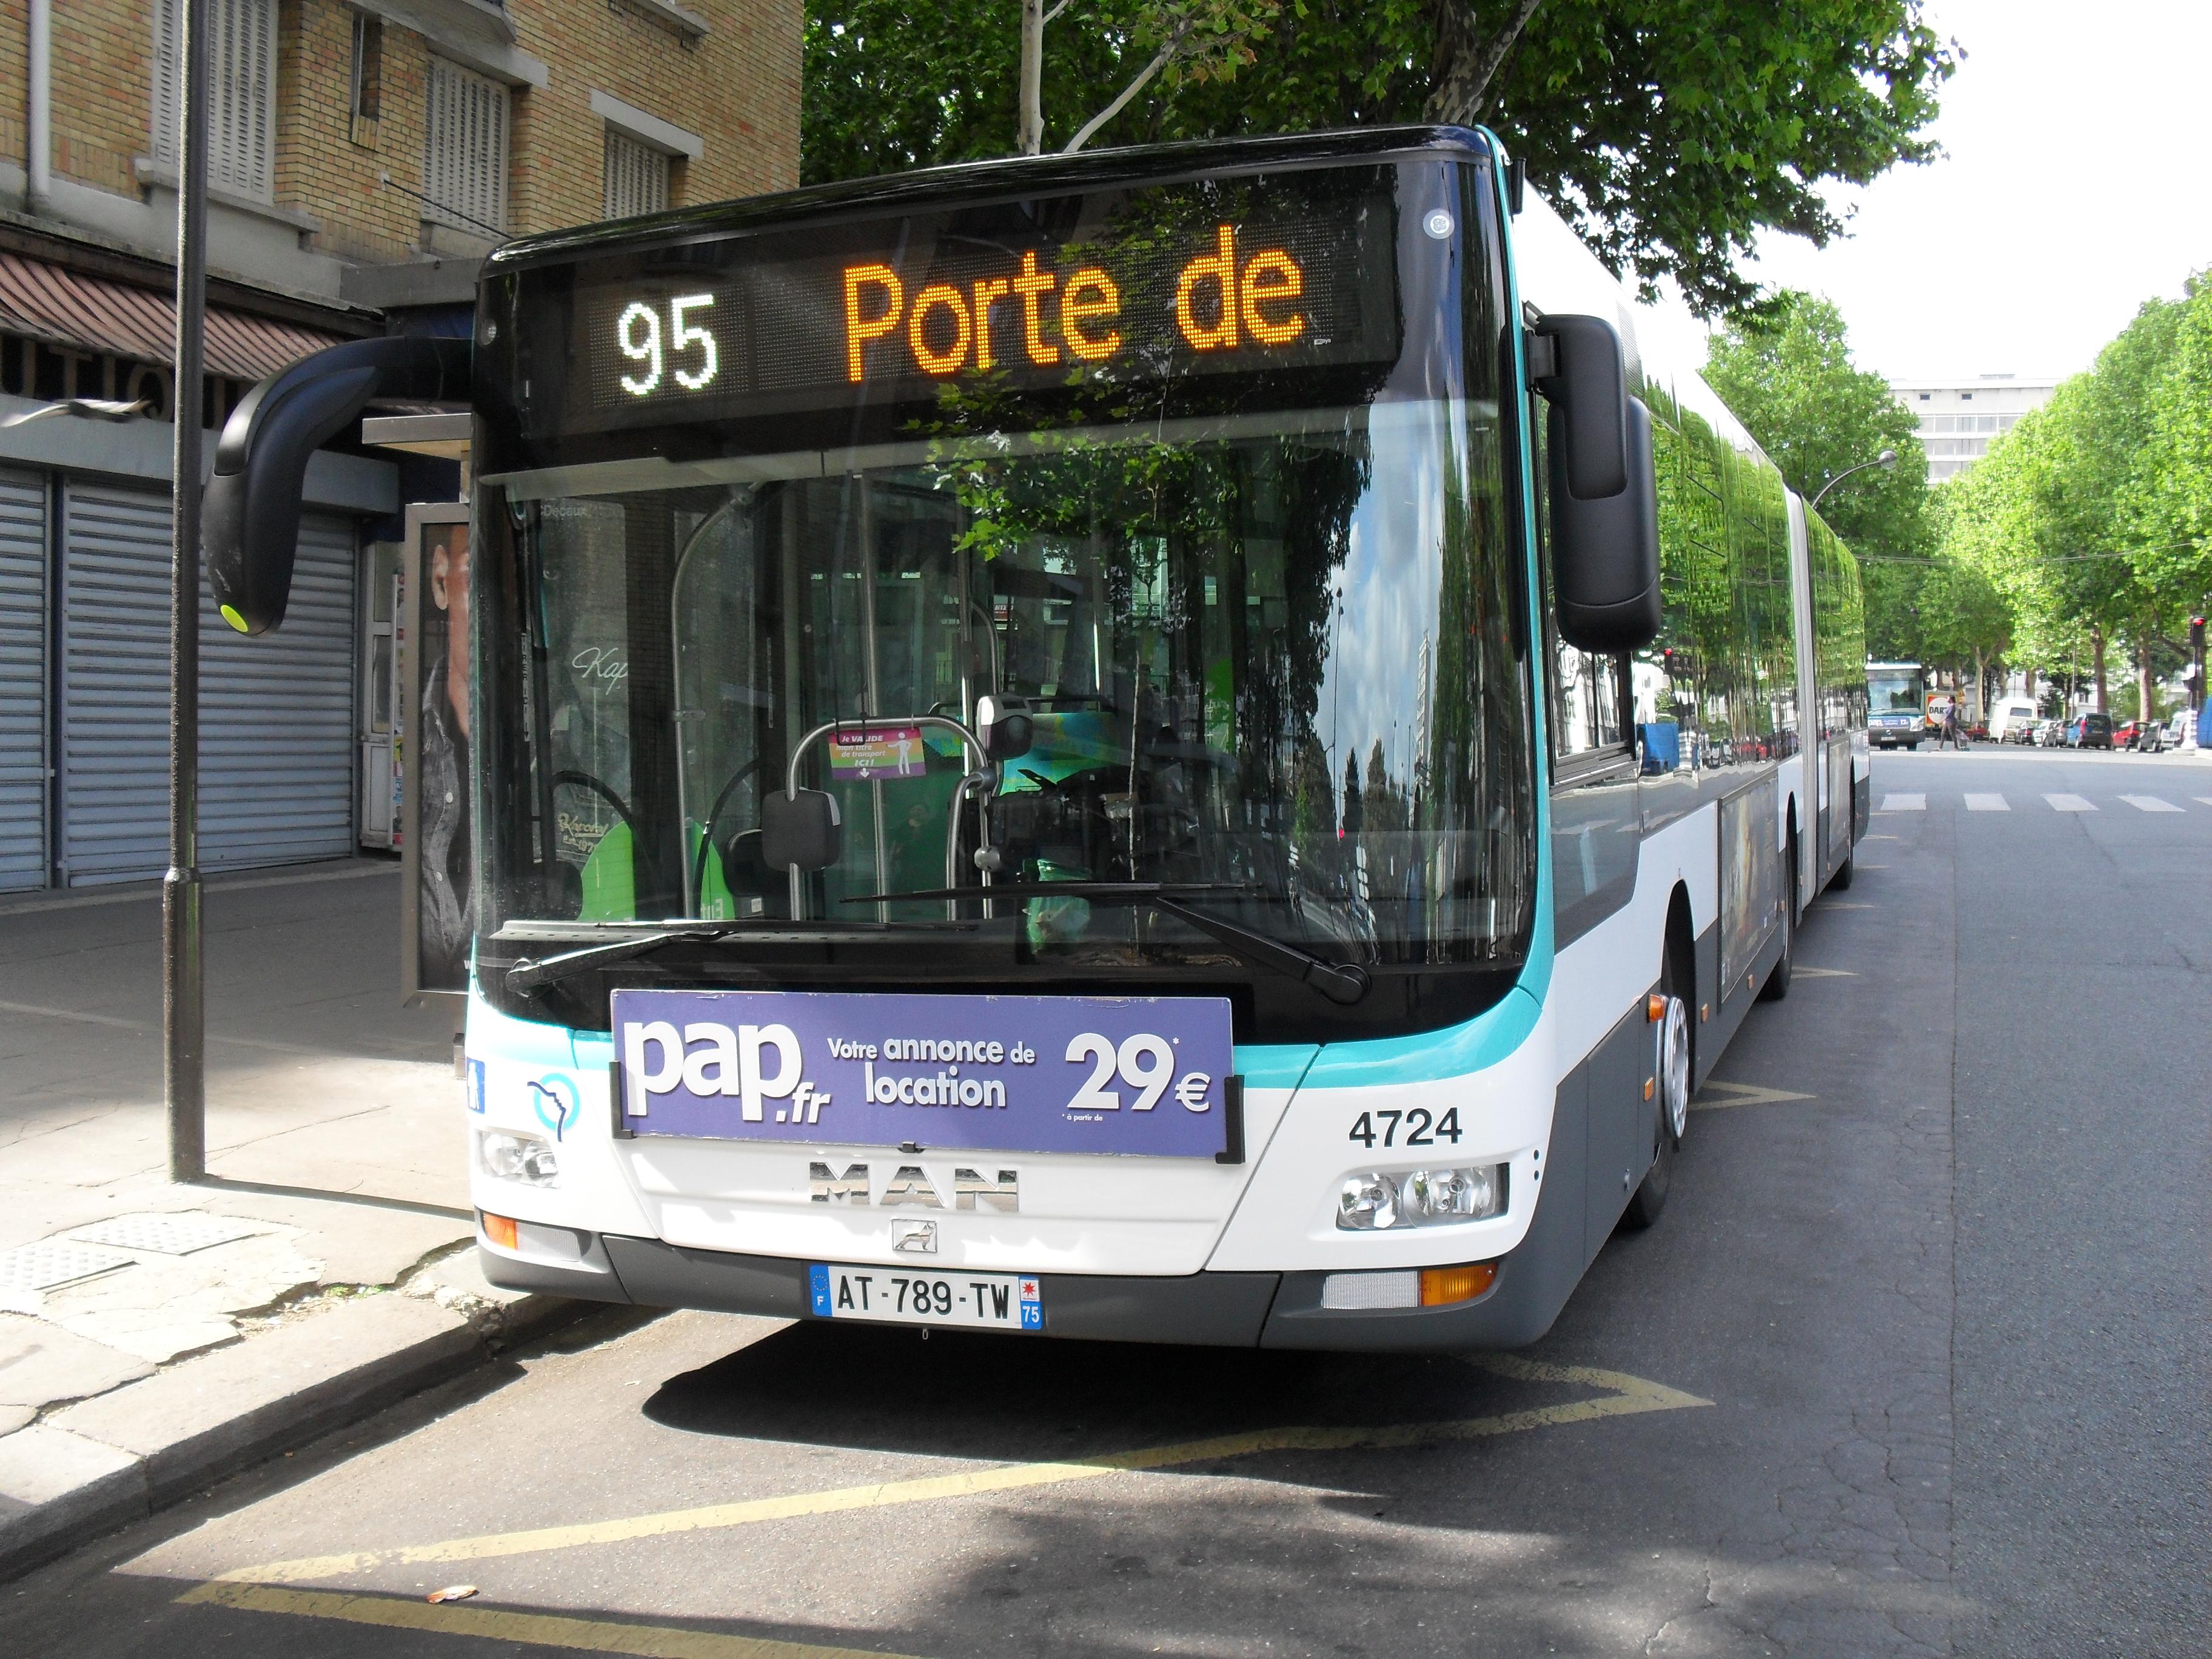 Rencontre Libertine En Pyrenees-Orientales (66)